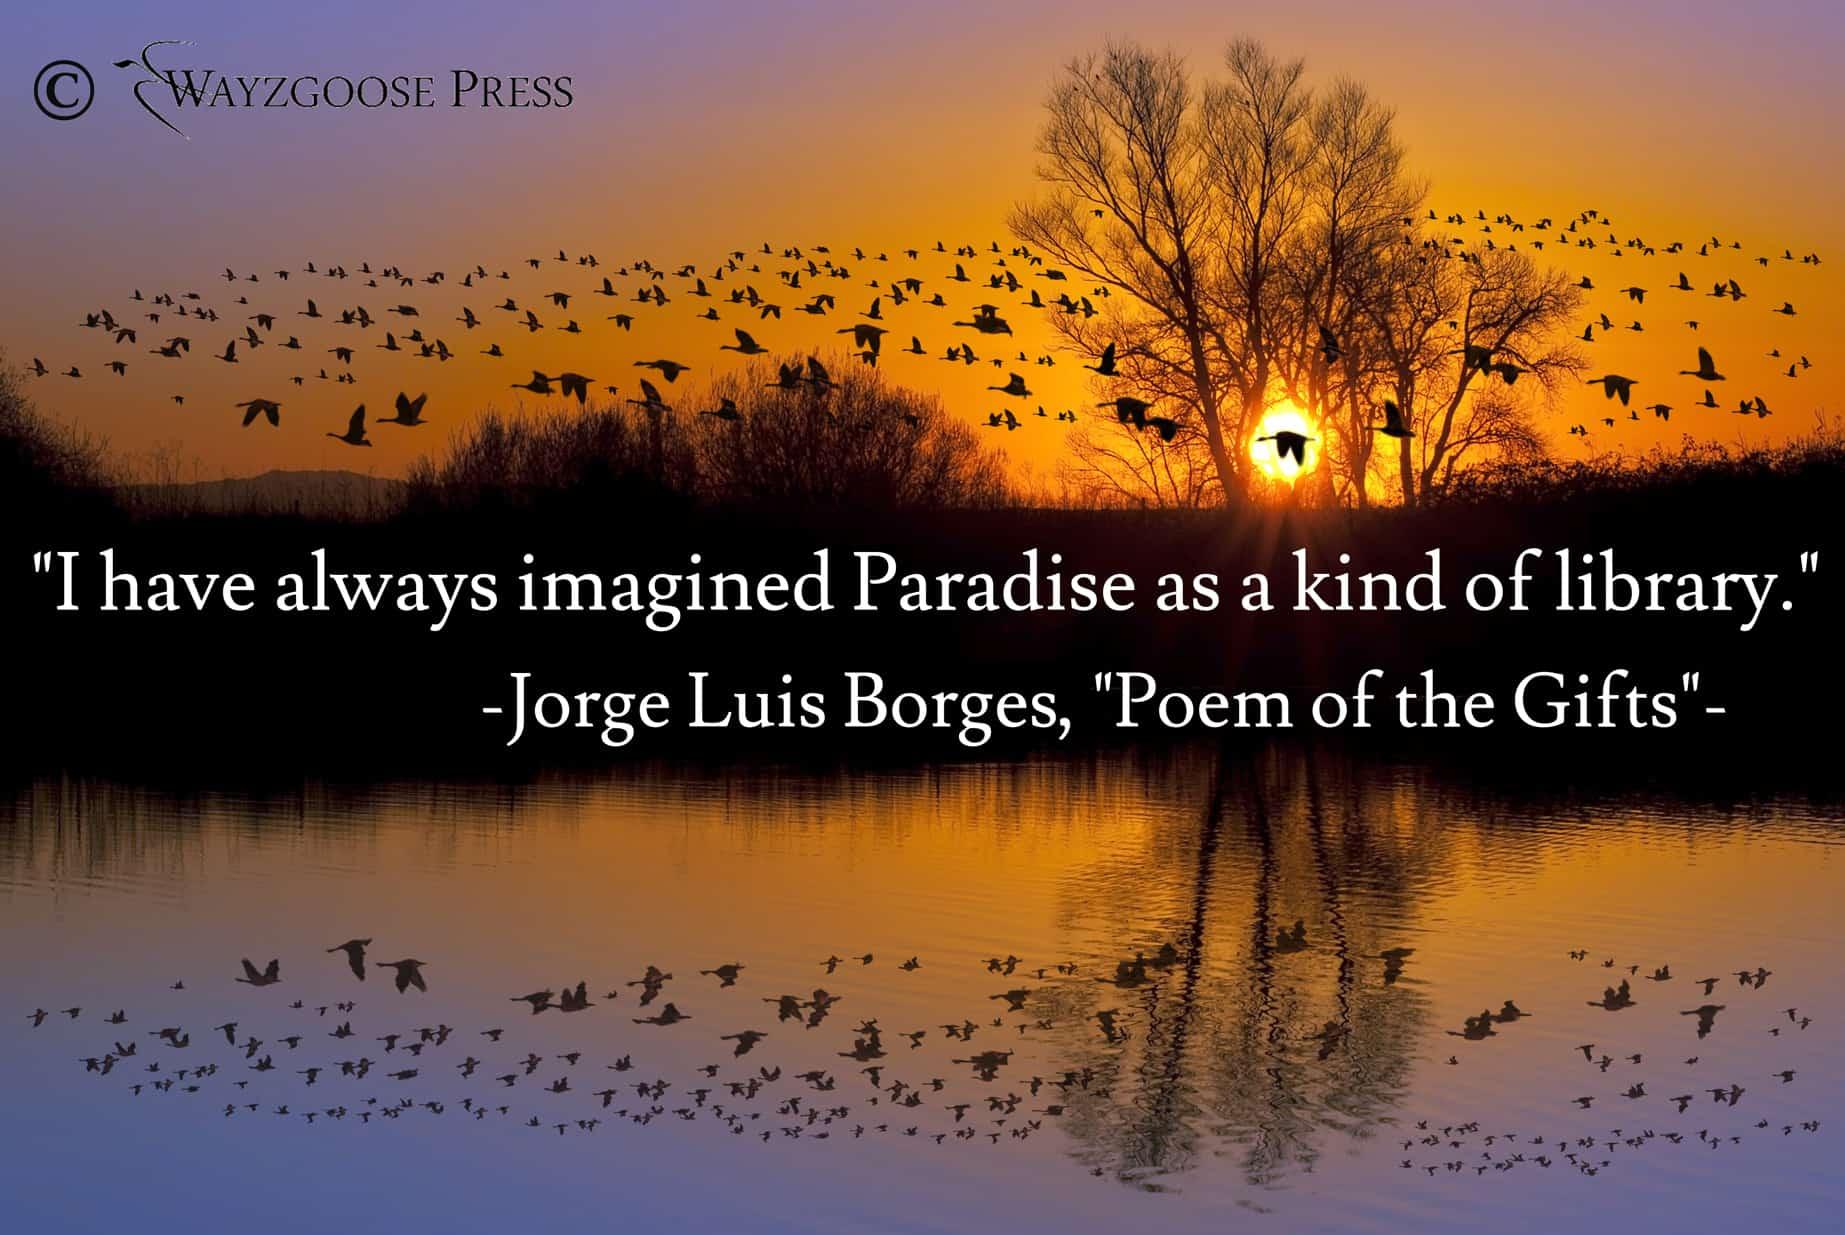 https://wayzgoosepress.com/wp-content/uploads/2016/10/BorgesQuote.jpg